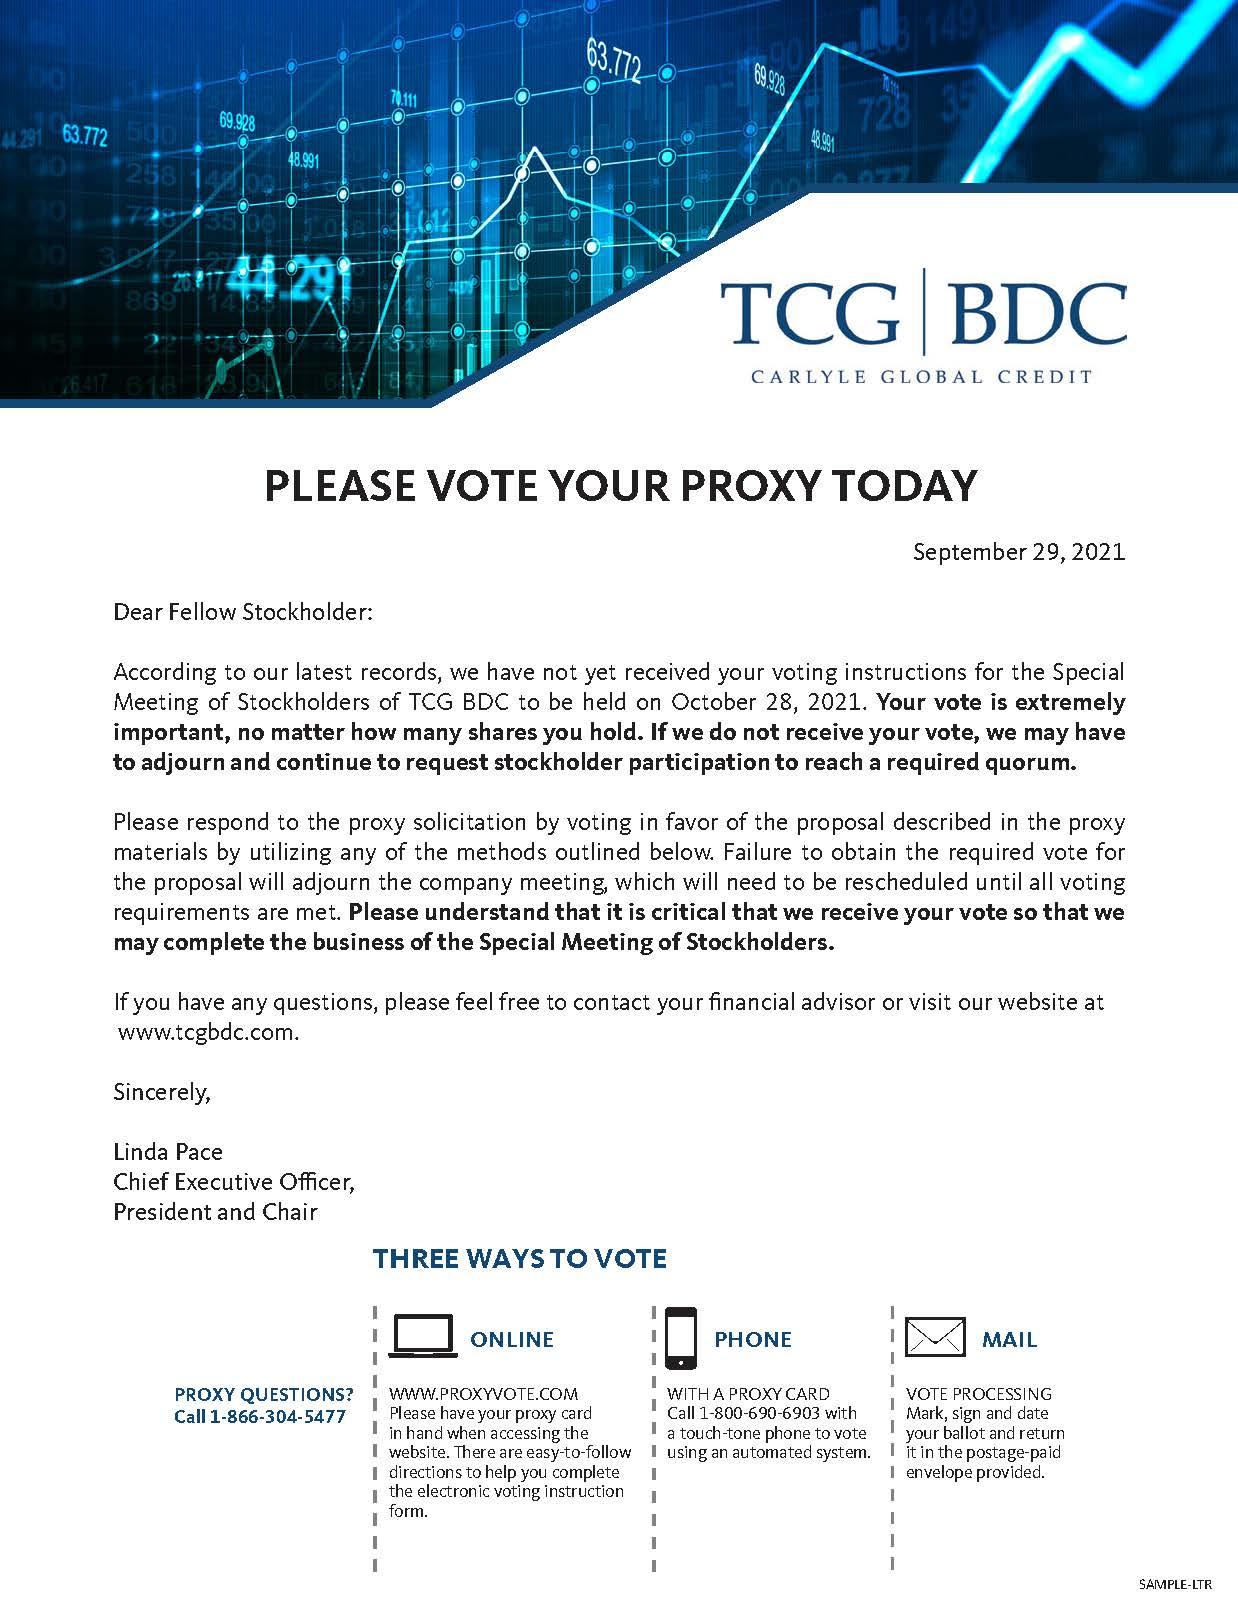 https://cdn.kscope.io/a37ebb148f2578cc3453f887afbff3e9-tcgbdcinc_shareholderletter.jpg